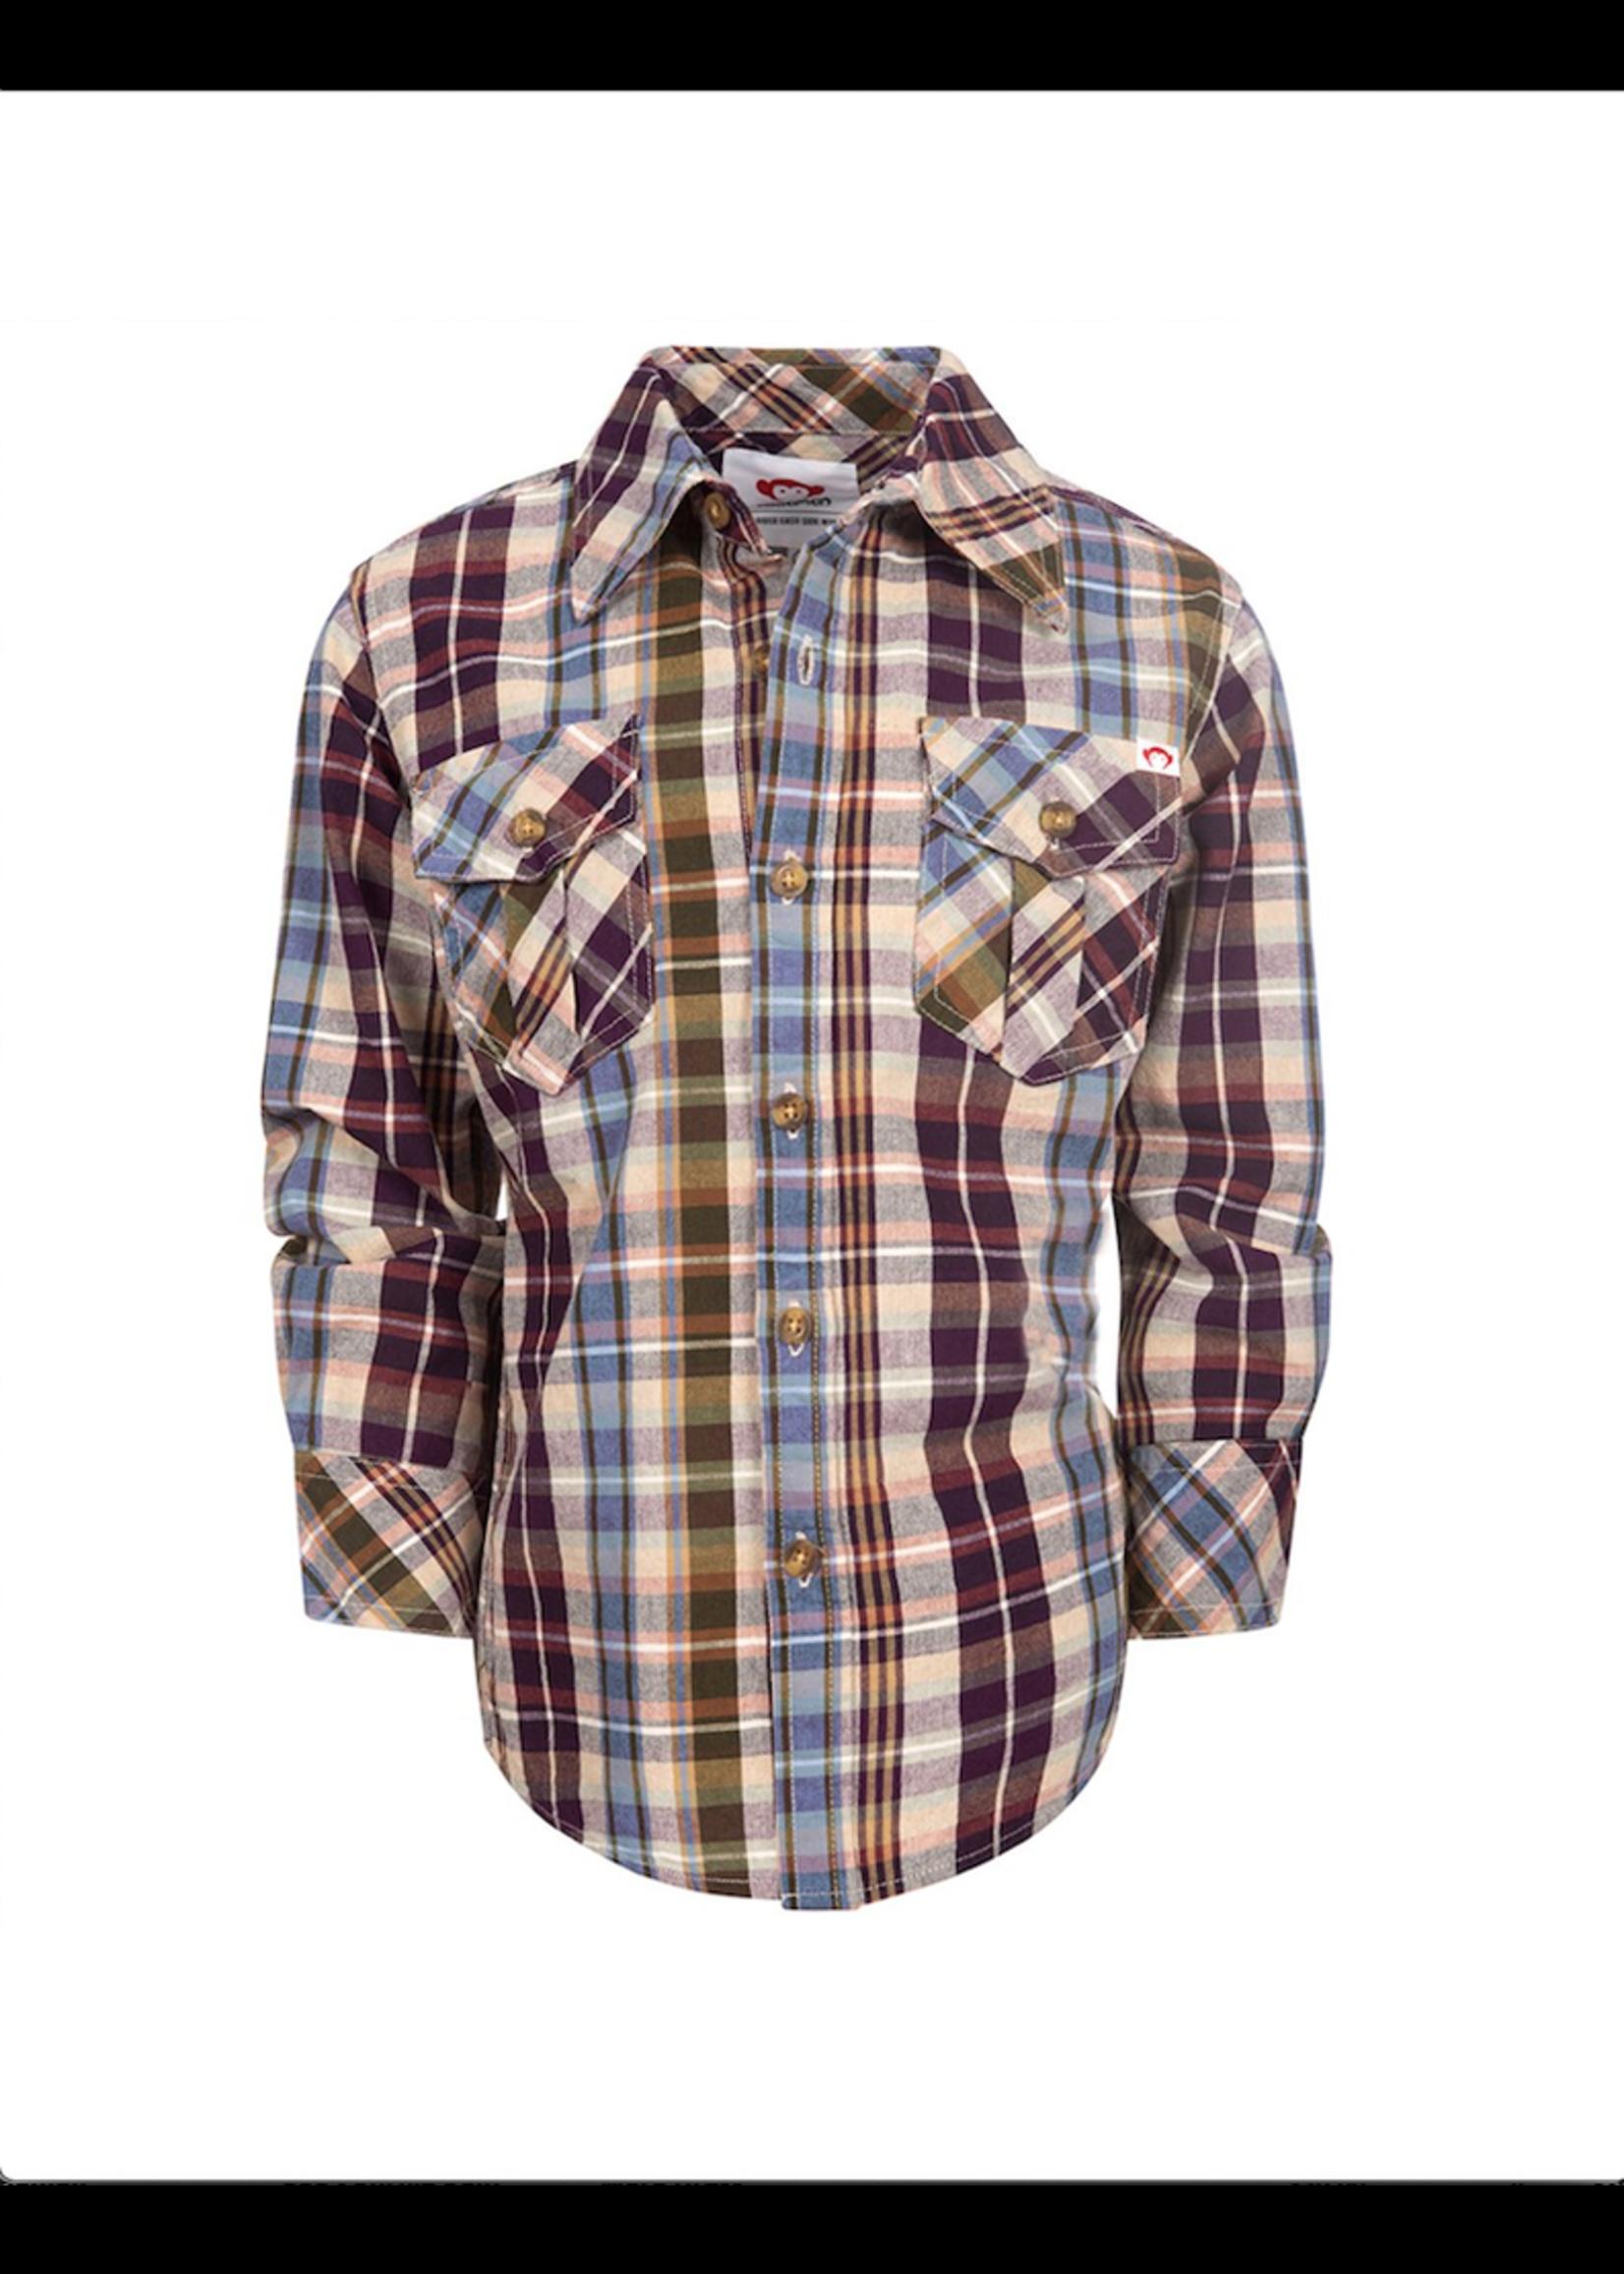 Appaman Appaman, Mecca Plaid Flannel Shirt